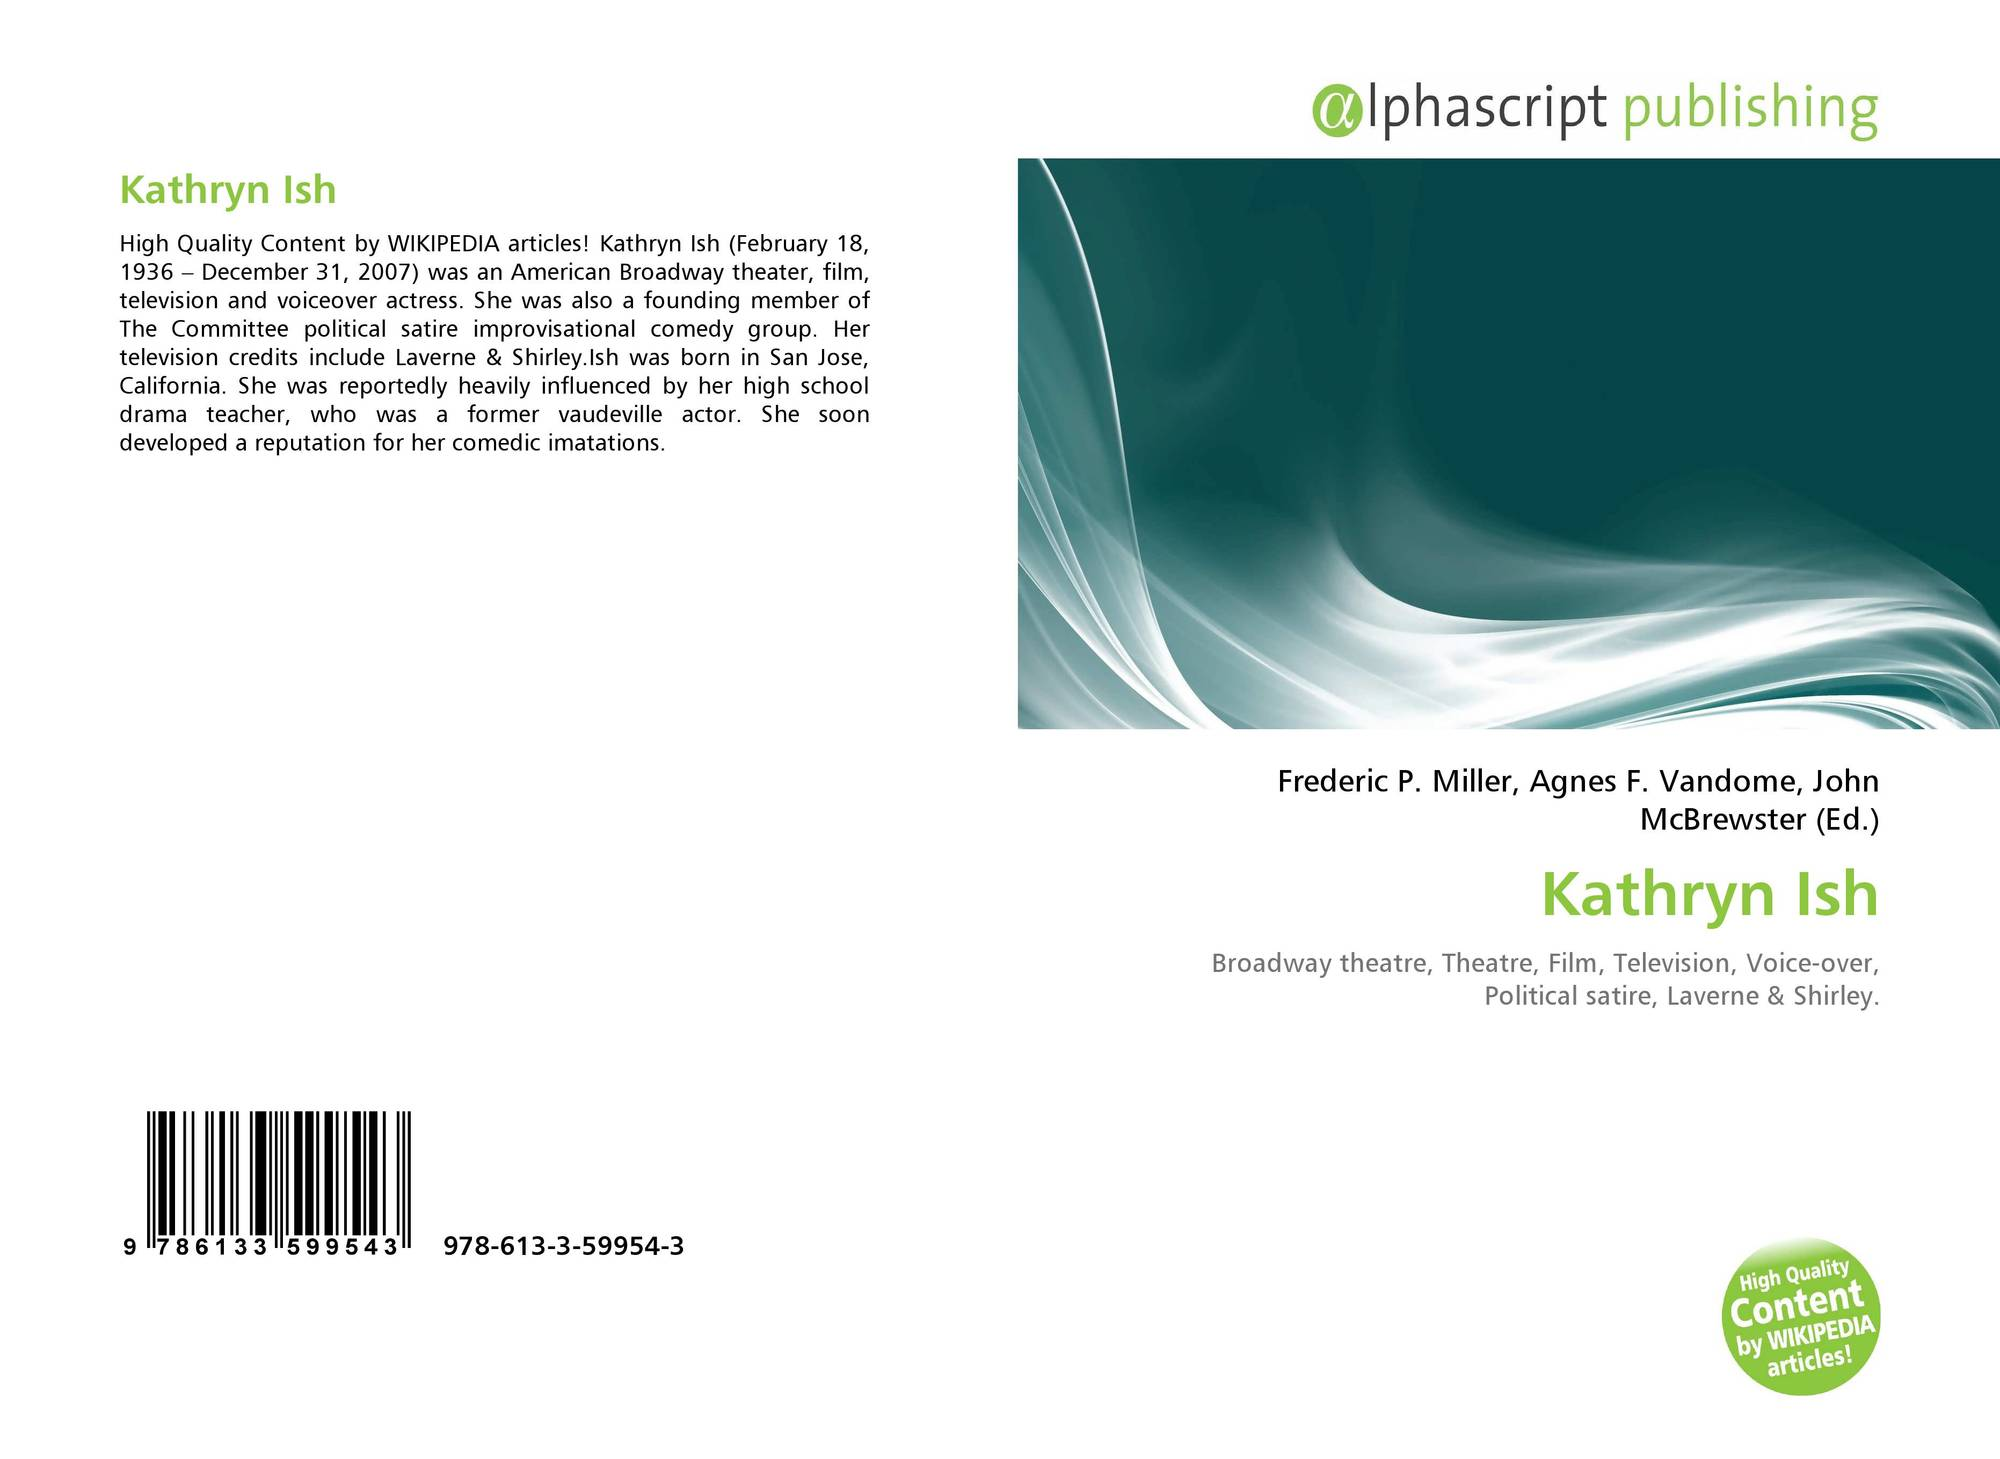 Communication on this topic: Liza Lapira, trevor-matthews/